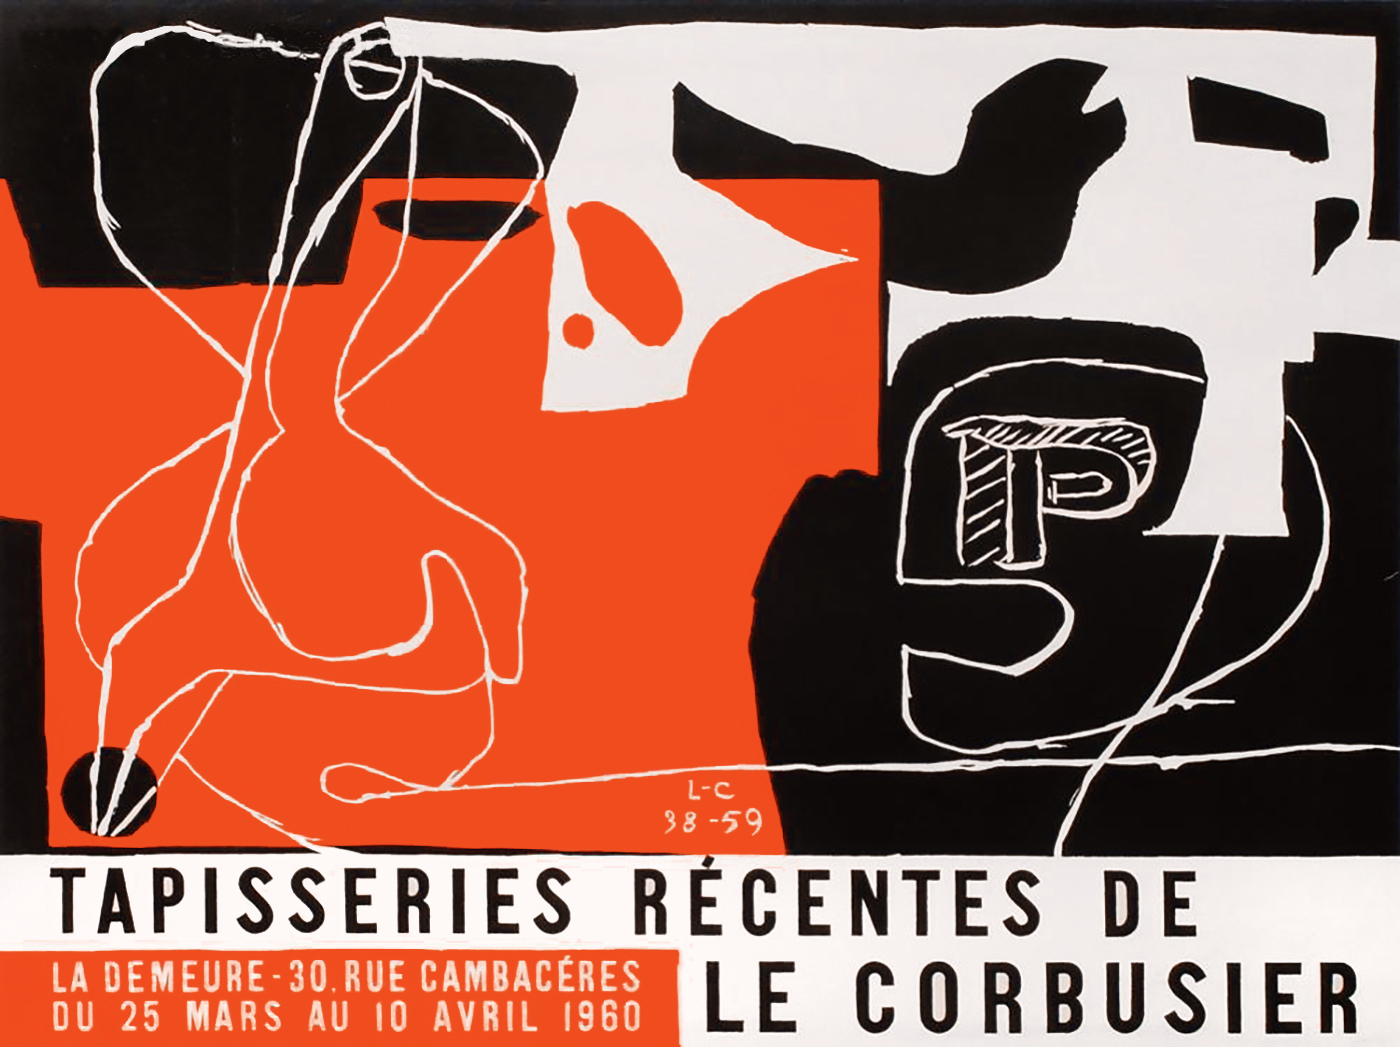 Le Corbusier Werke : le corbusier 1960 la demeure ausstellung plakat lithographie ~ A.2002-acura-tl-radio.info Haus und Dekorationen